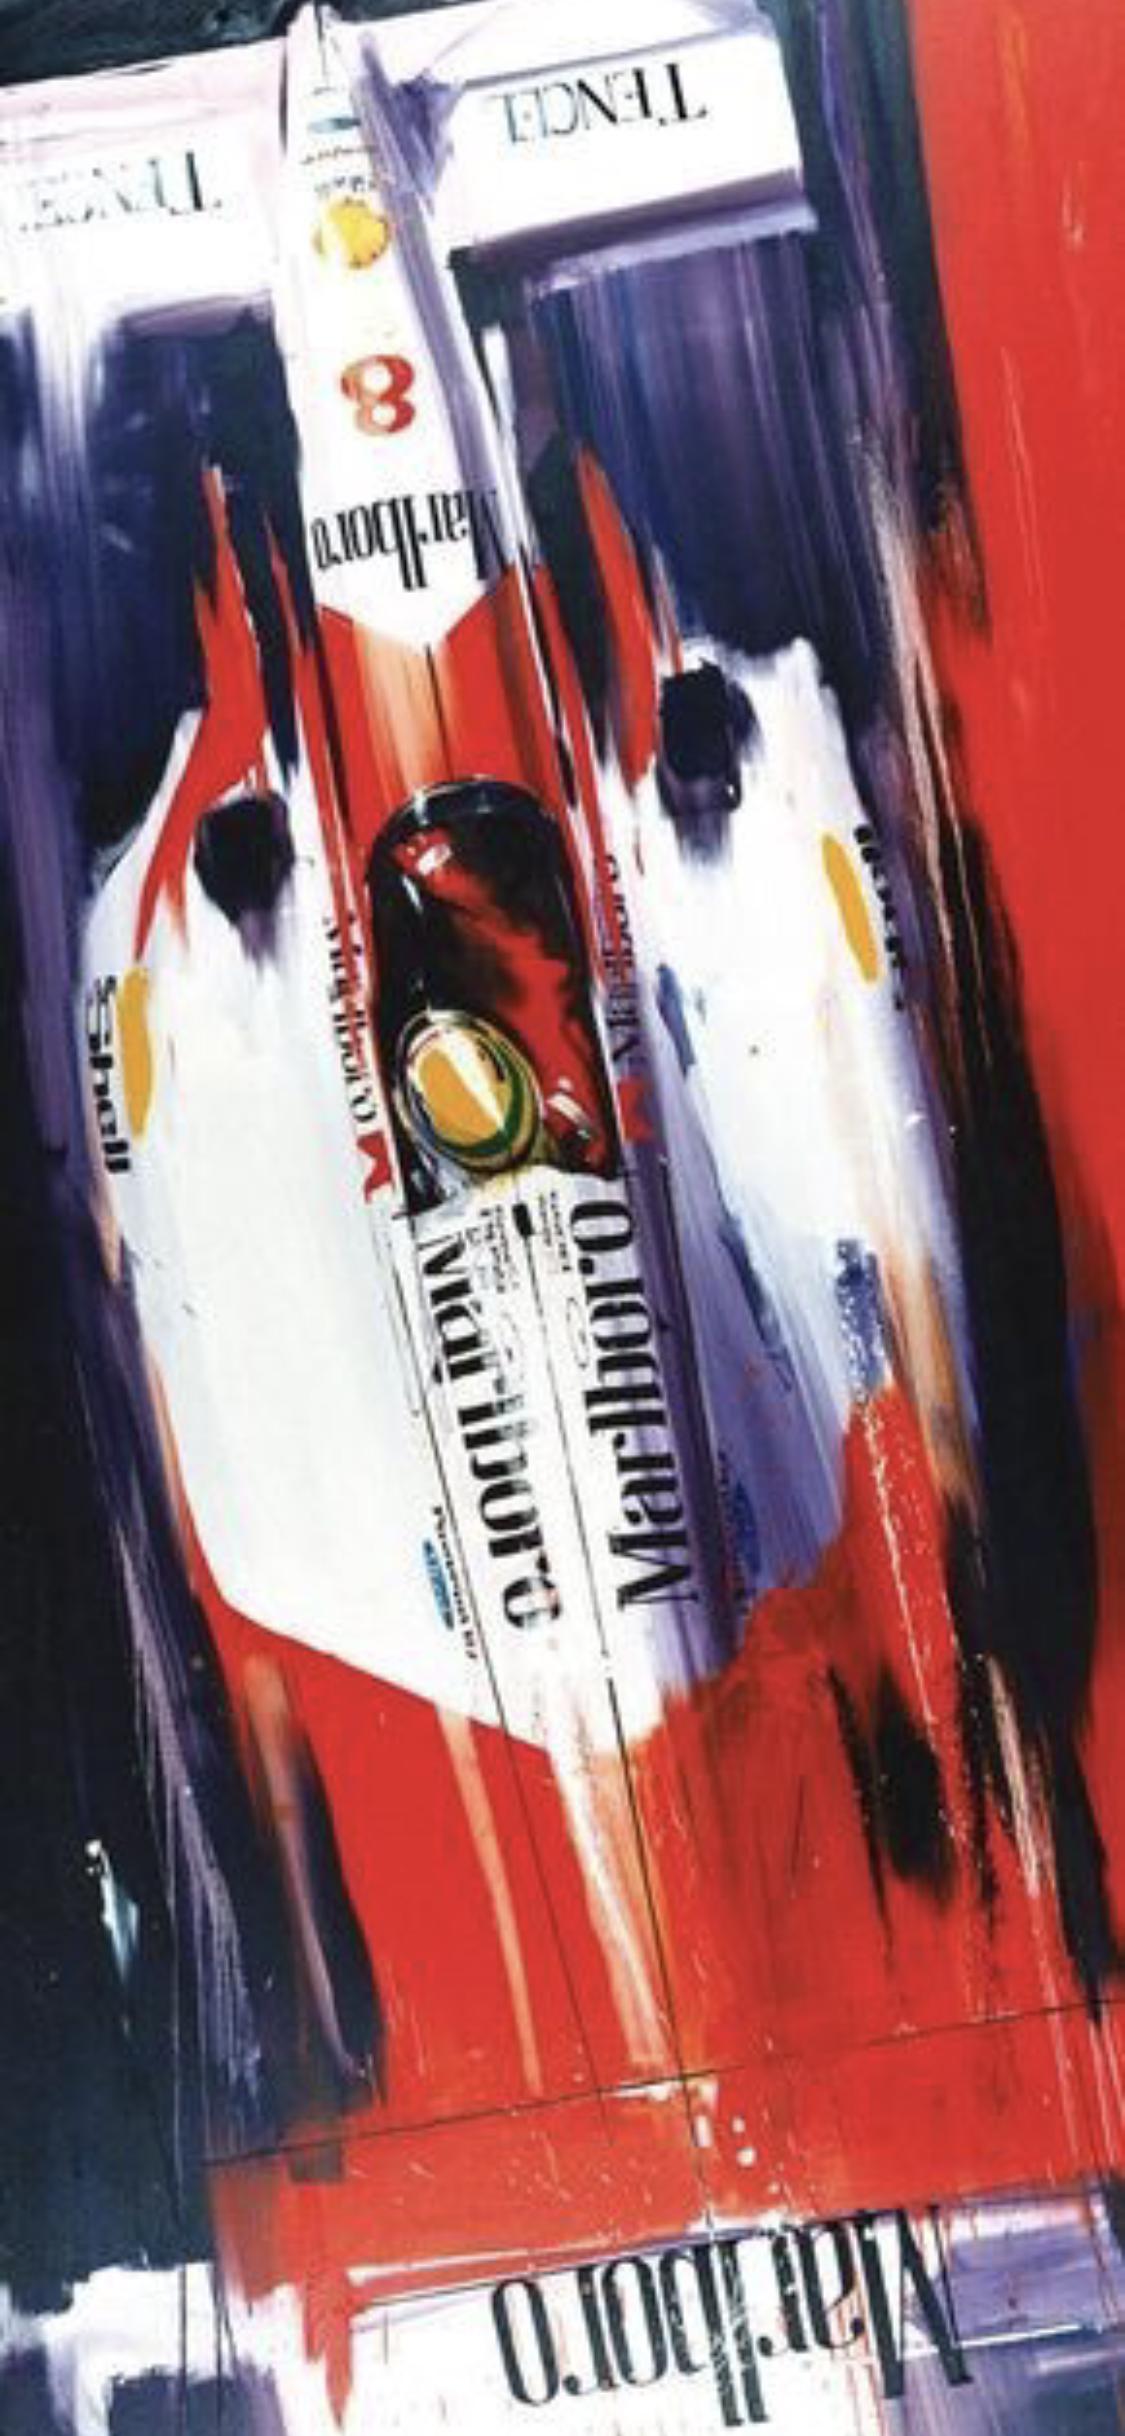 Wallpaper Iphone X Ayrton Senna Pintura Automotiva Arte Para Automovel